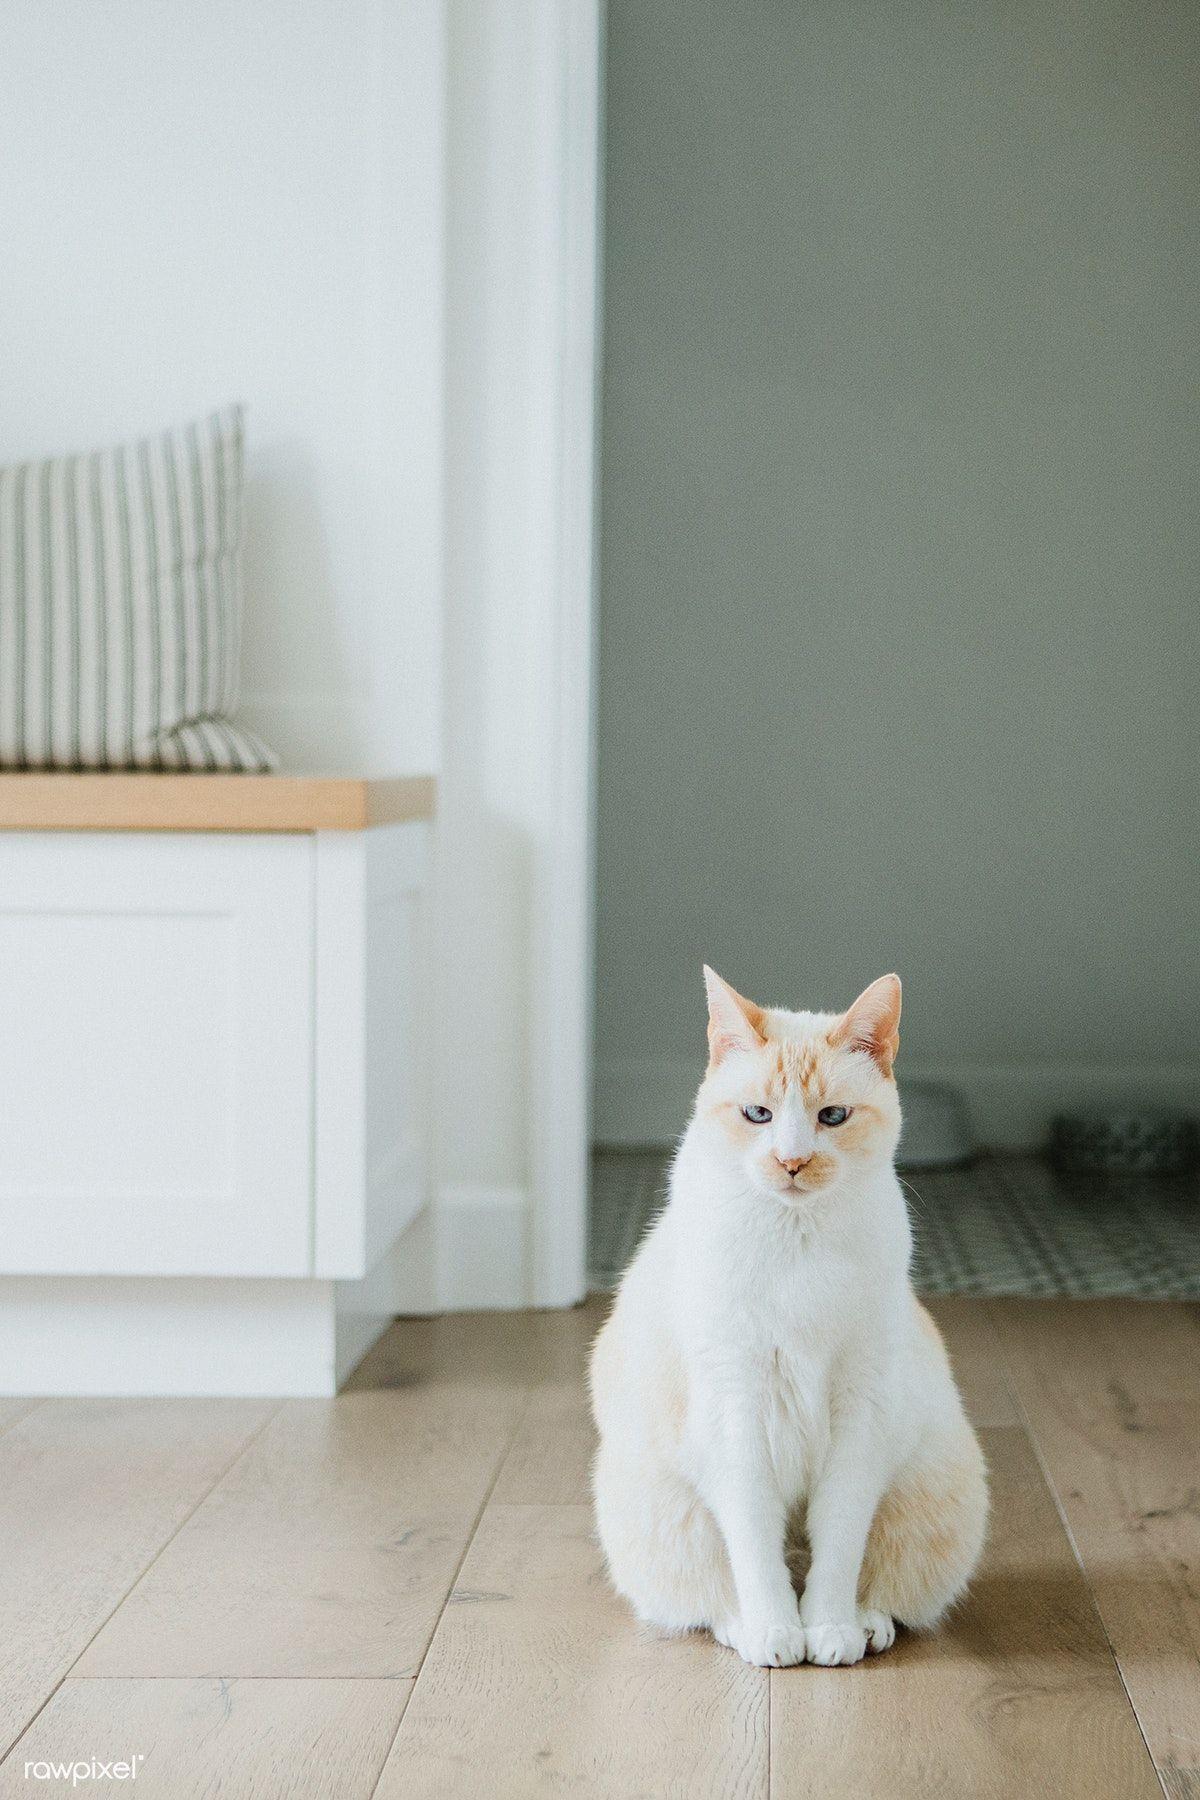 Pet Cat Sitting On Hardwood Floor